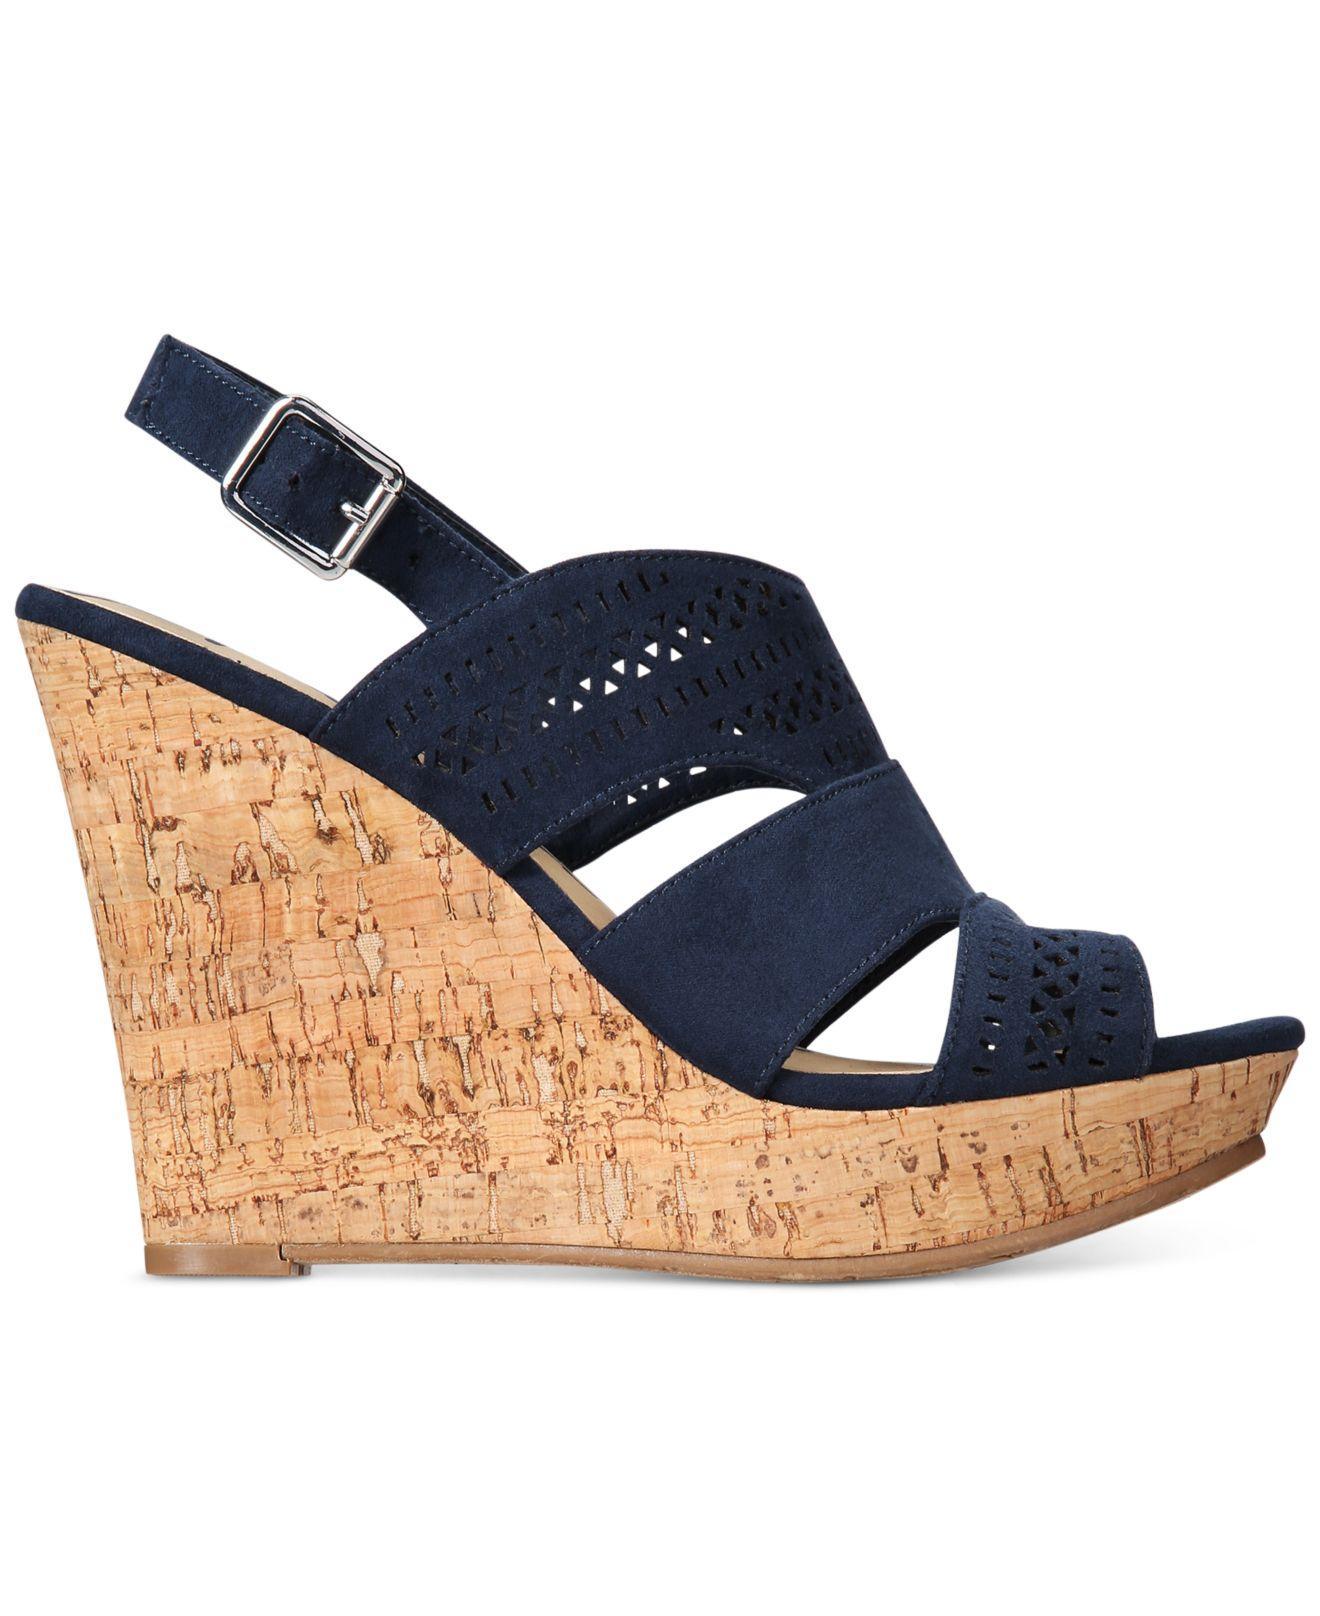 American Rag Sandals Womens Amirranda Peep Toe Casual Platform Sandals Rag Navy Size 70 aeb1b7